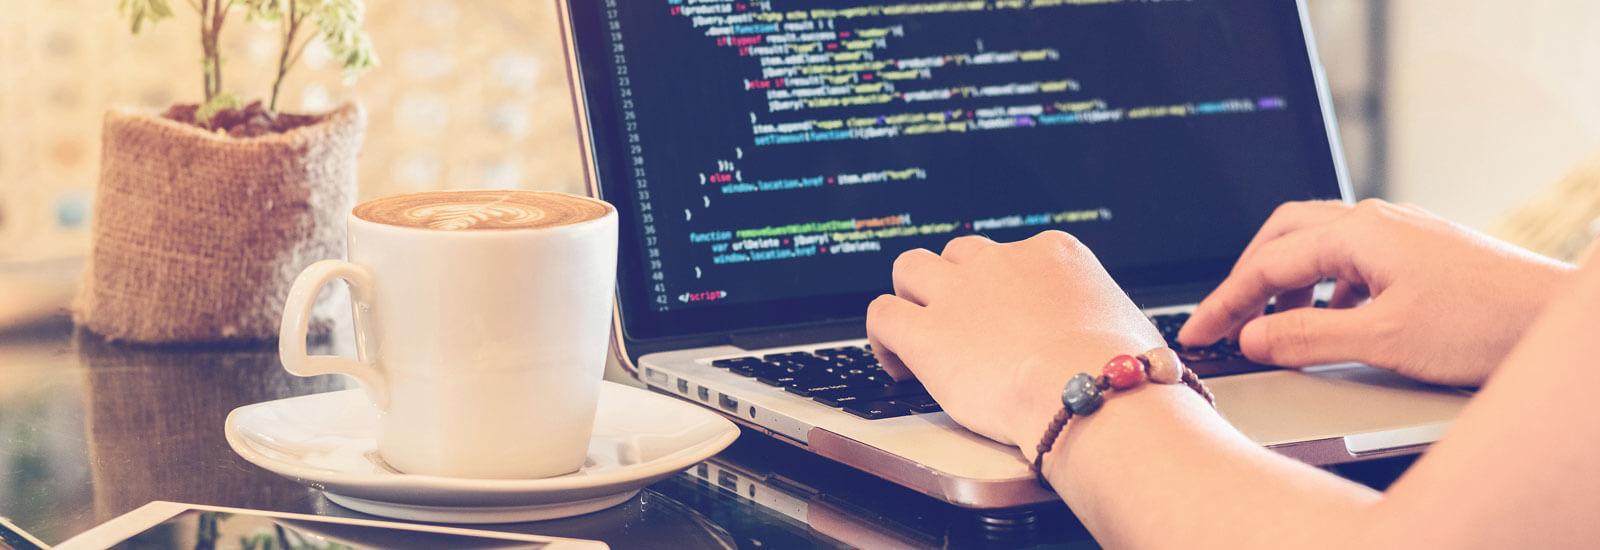 Technological Breakthrough in Web Development – SETUP EXPERTS